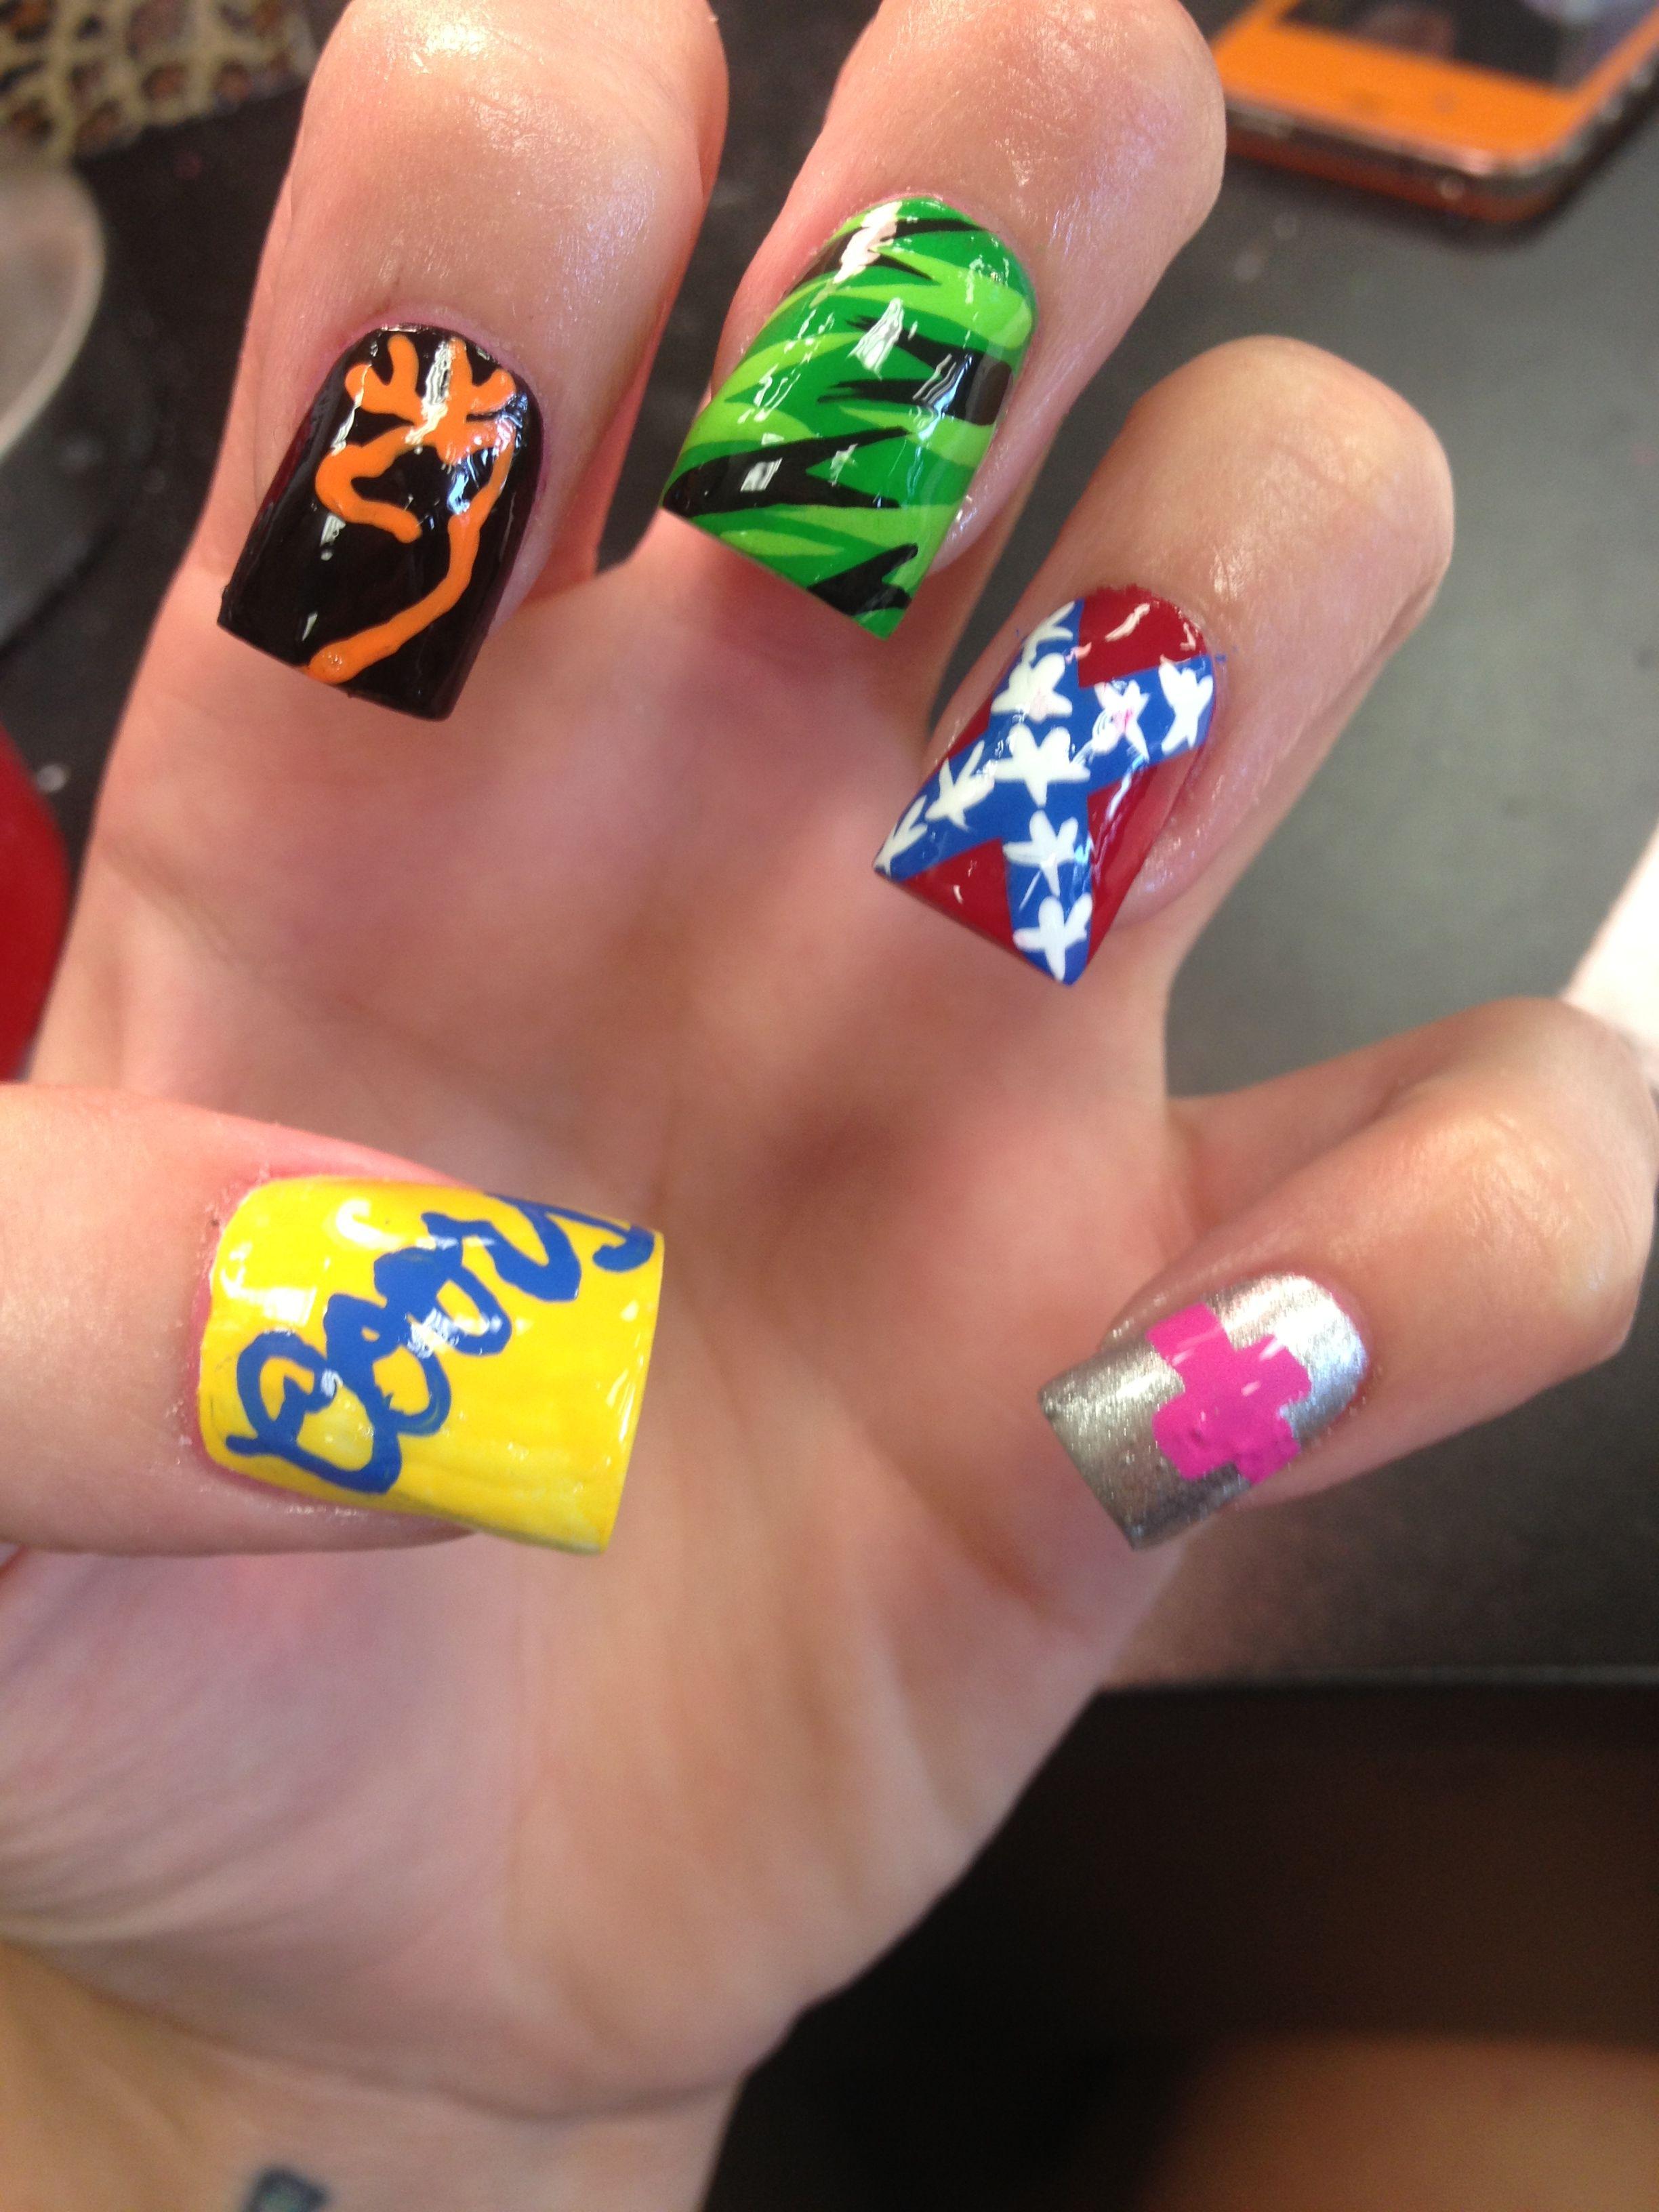 Redneck Nails Nails Make Up Hair Pinterest Redneck Nails